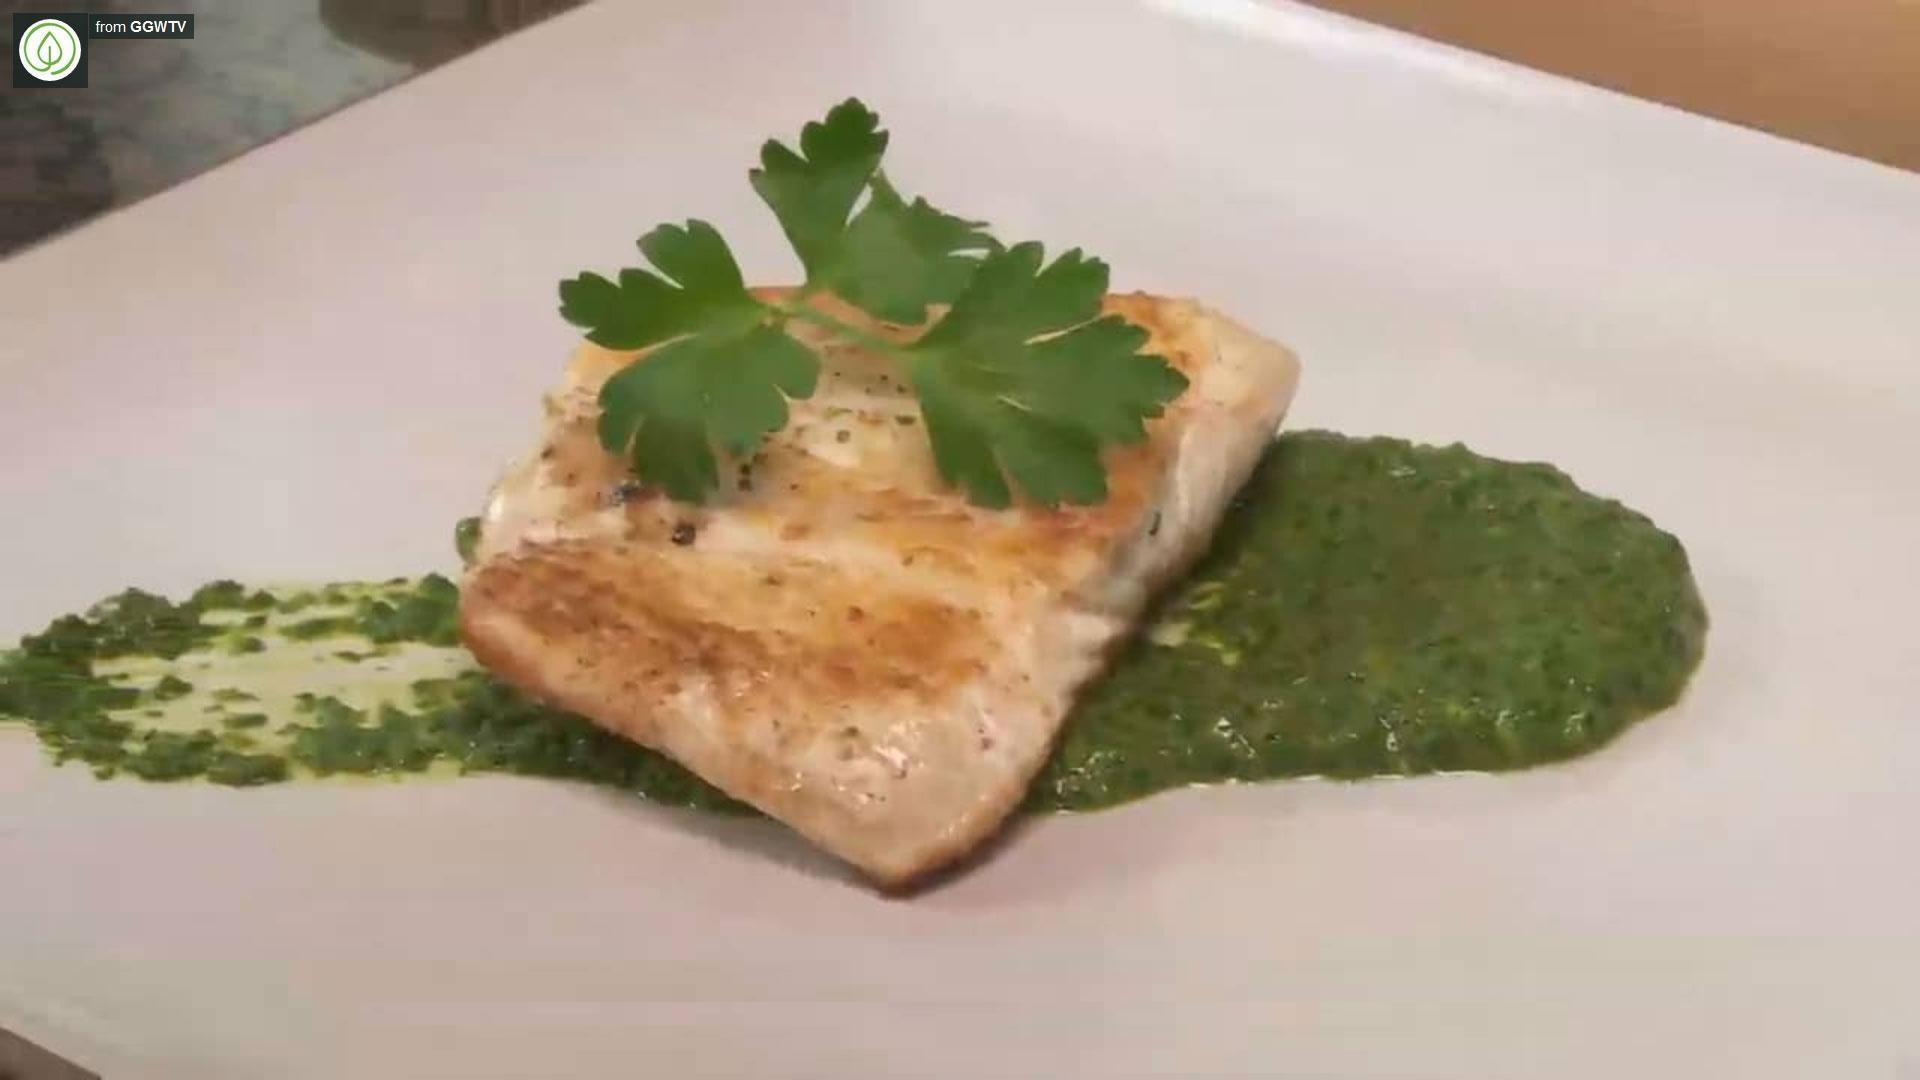 Easy, Garden-Inspired Recipes